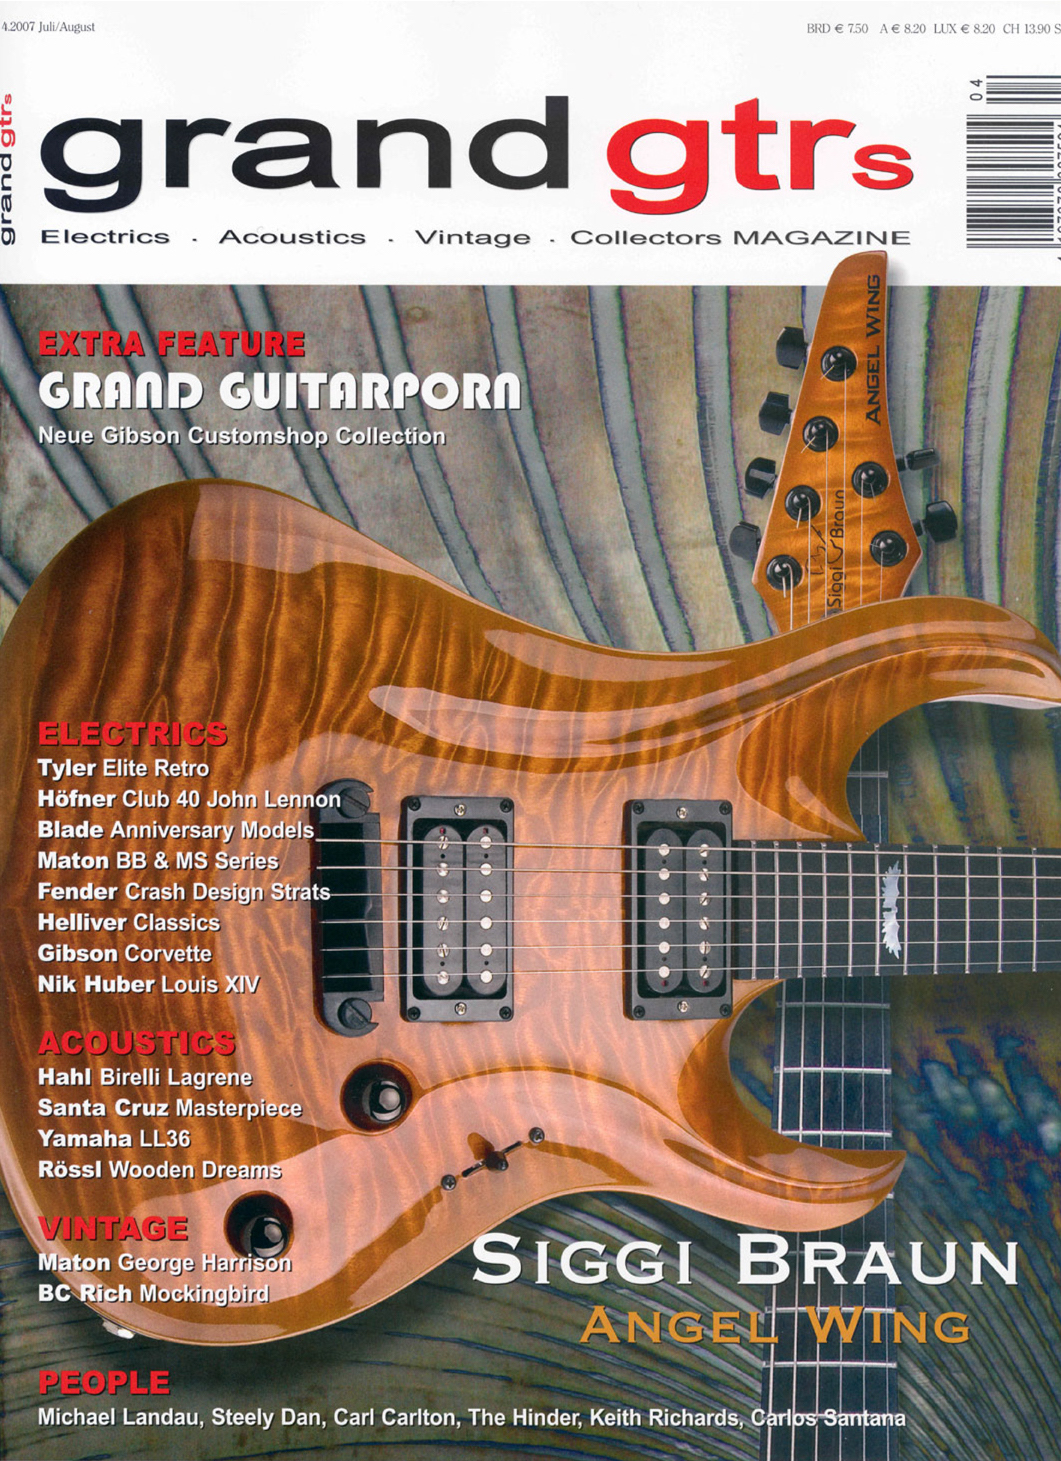 2007 Grand Guitars